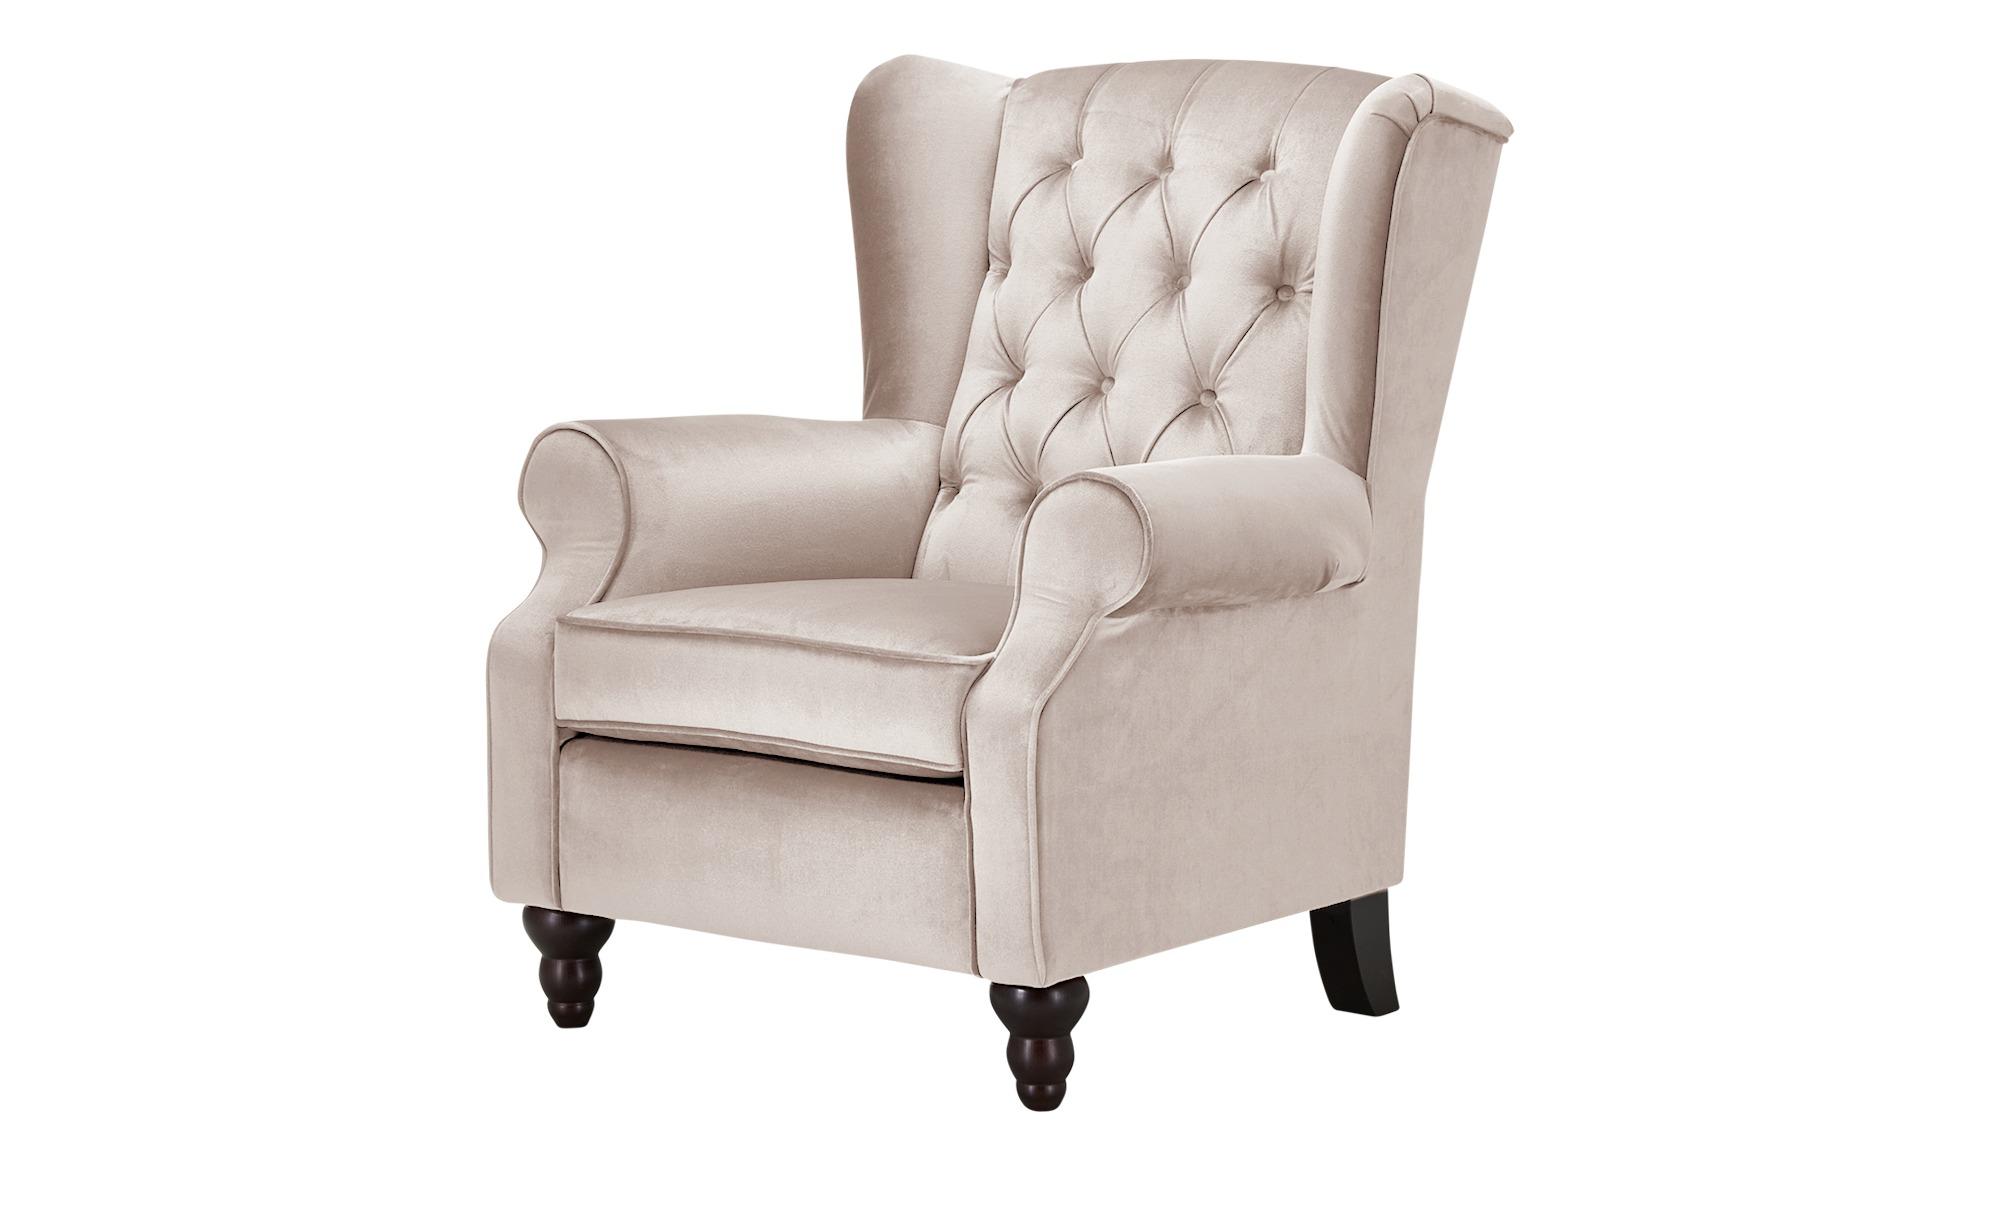 Ohrensessel  Canyon ¦ rosa/pink ¦ Maße (cm): B: 83 H: 102 T: 89 Polstermöbel > Sessel > Ohrensessel - Höffner